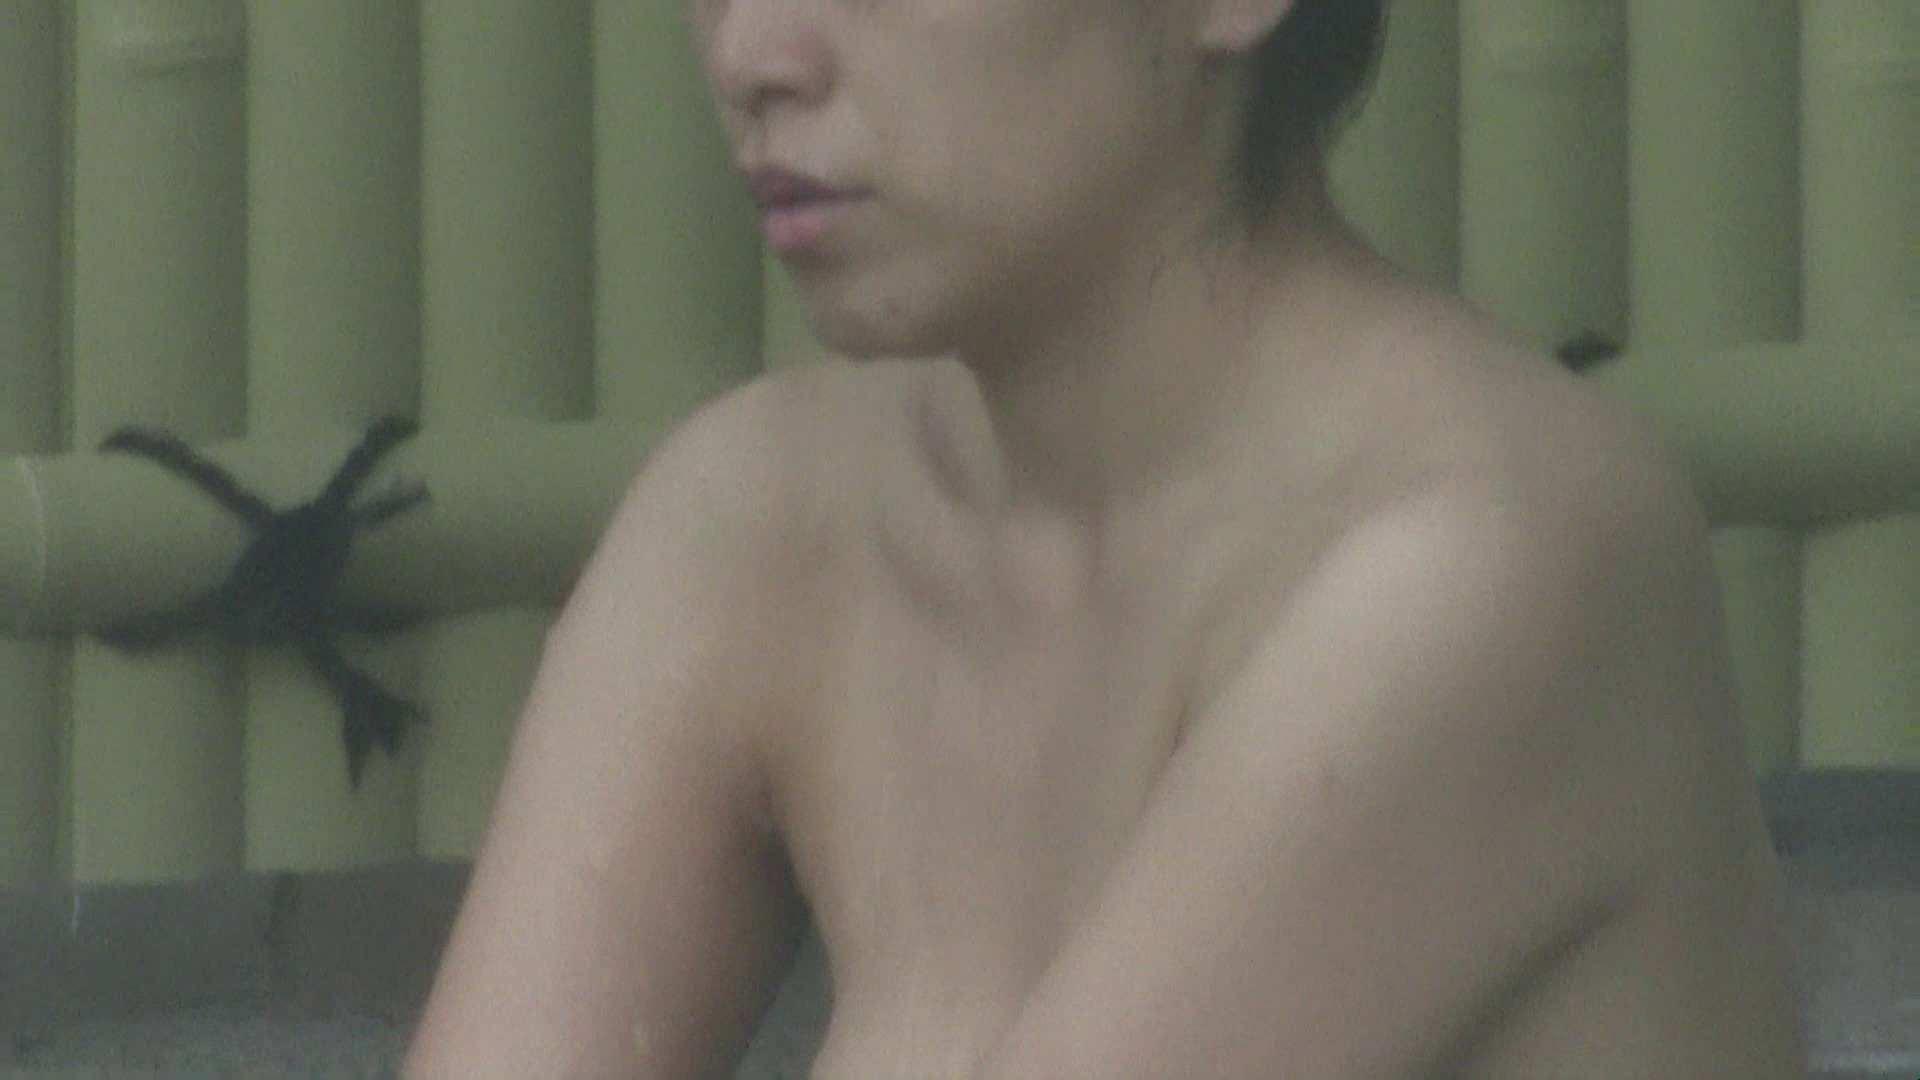 Aquaな露天風呂Vol.585 露天 オマンコ無修正動画無料 51画像 26